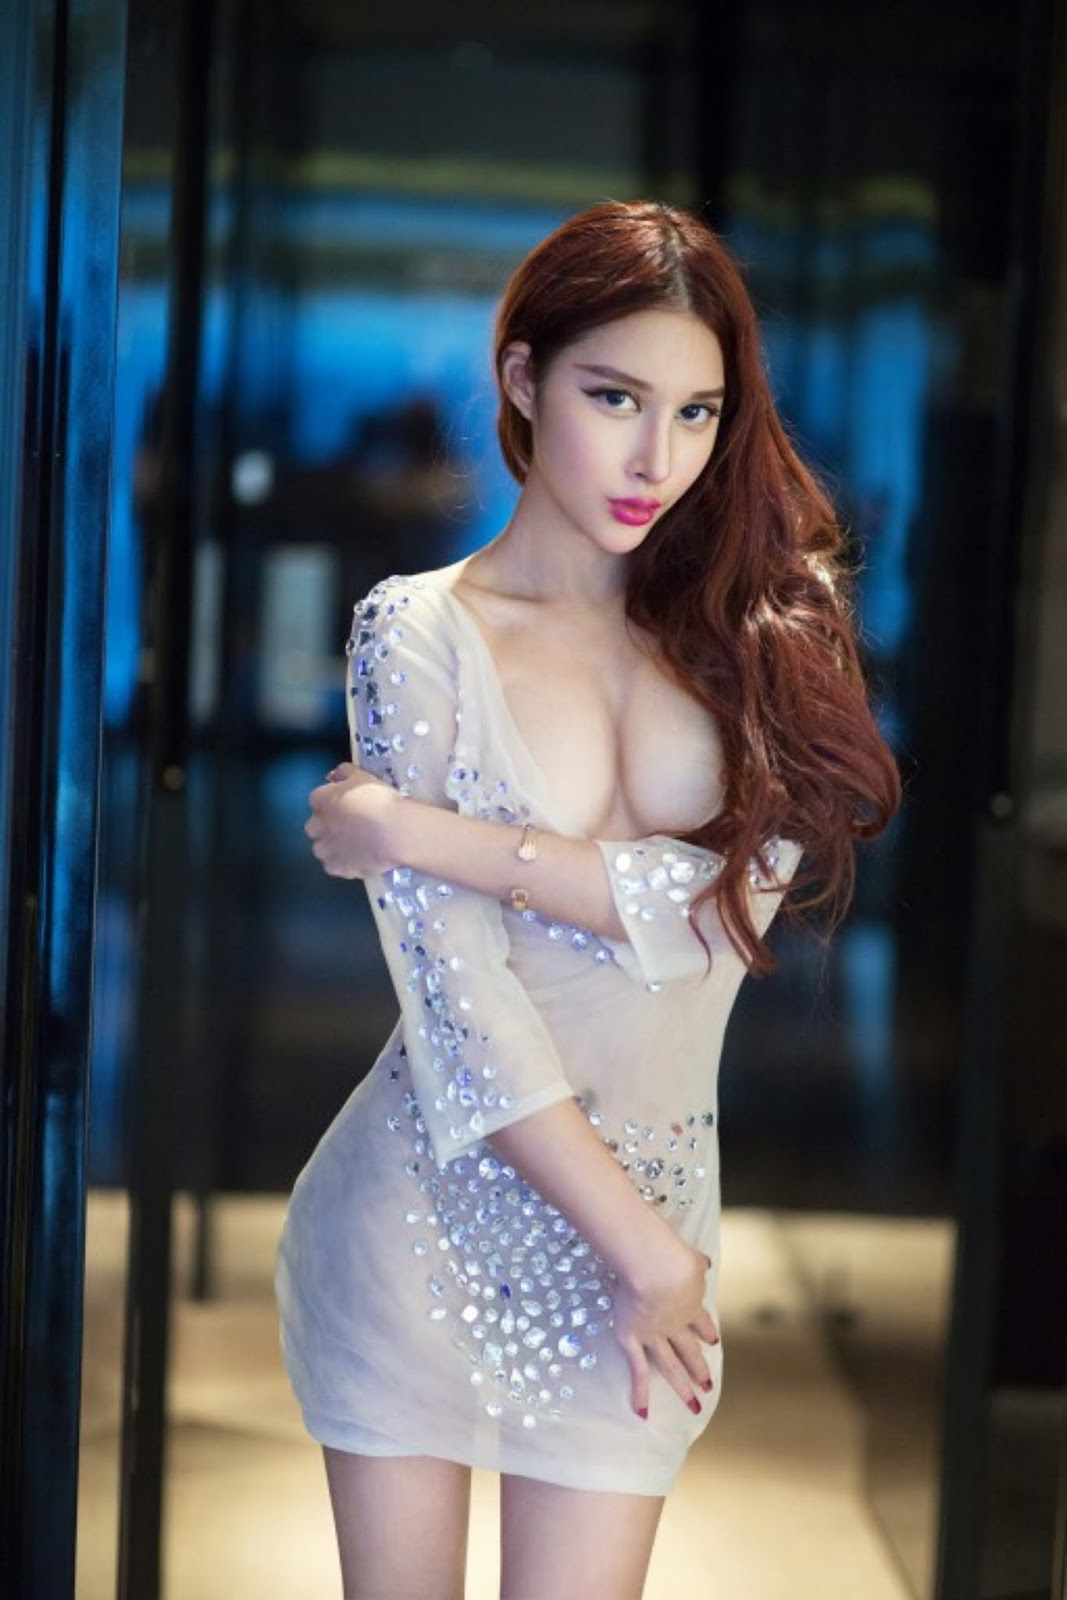 %25C2%25B1 %25C2%25B1 19 - Model Nude TUIGIRL NO.49 Beauty Body Tits